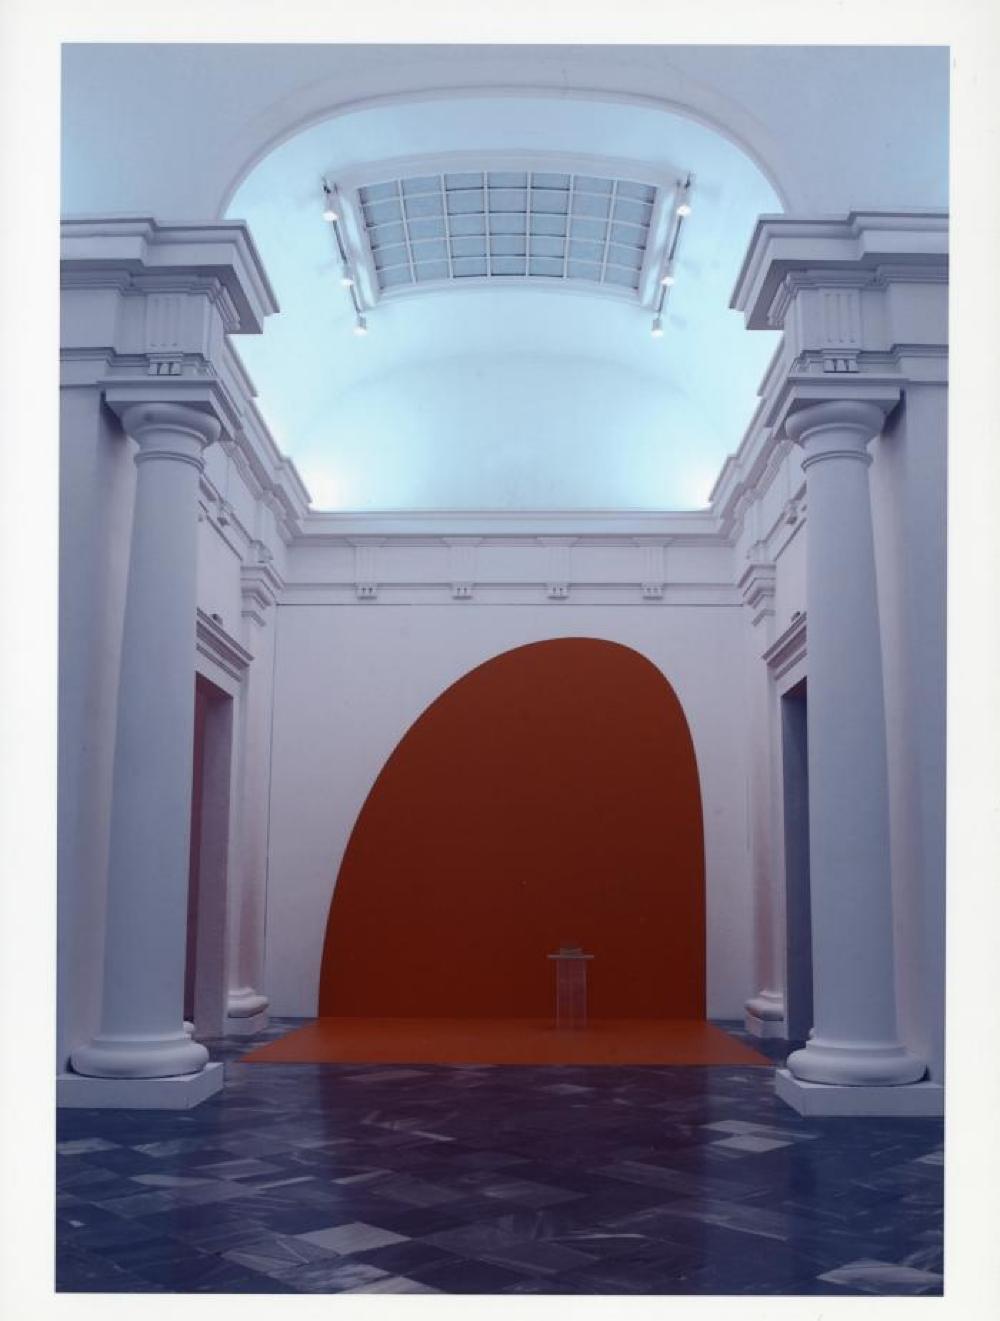 """Isamu Noguchi: A Study in Space,"" Italdesign, Giugiaro Museum, May 8, 2001 - January 2002."